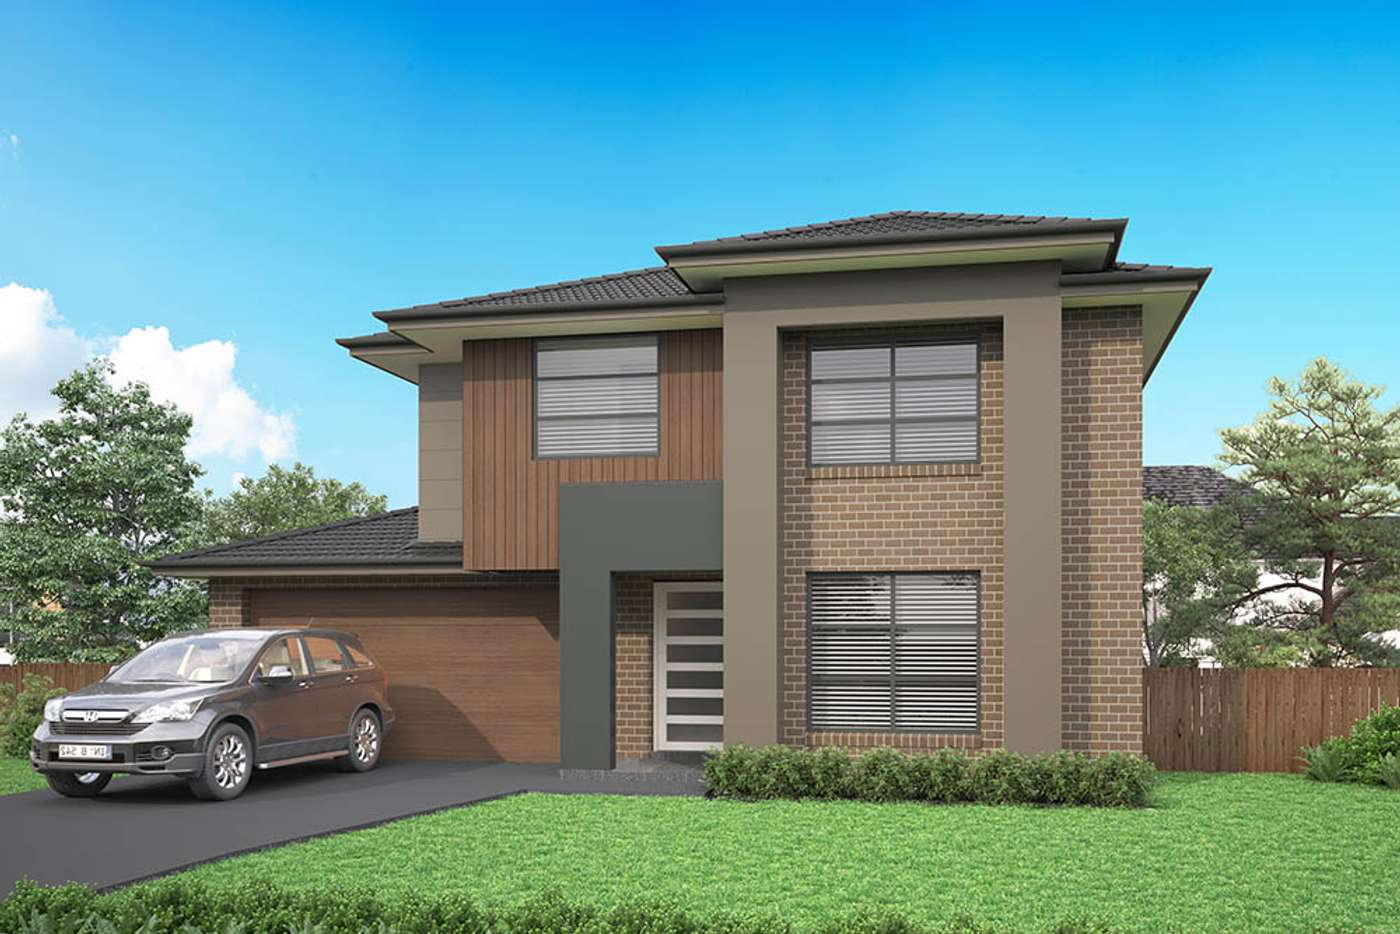 Main view of Homely house listing, Lot 720 Sandakan Street, Edmondson Park NSW 2174